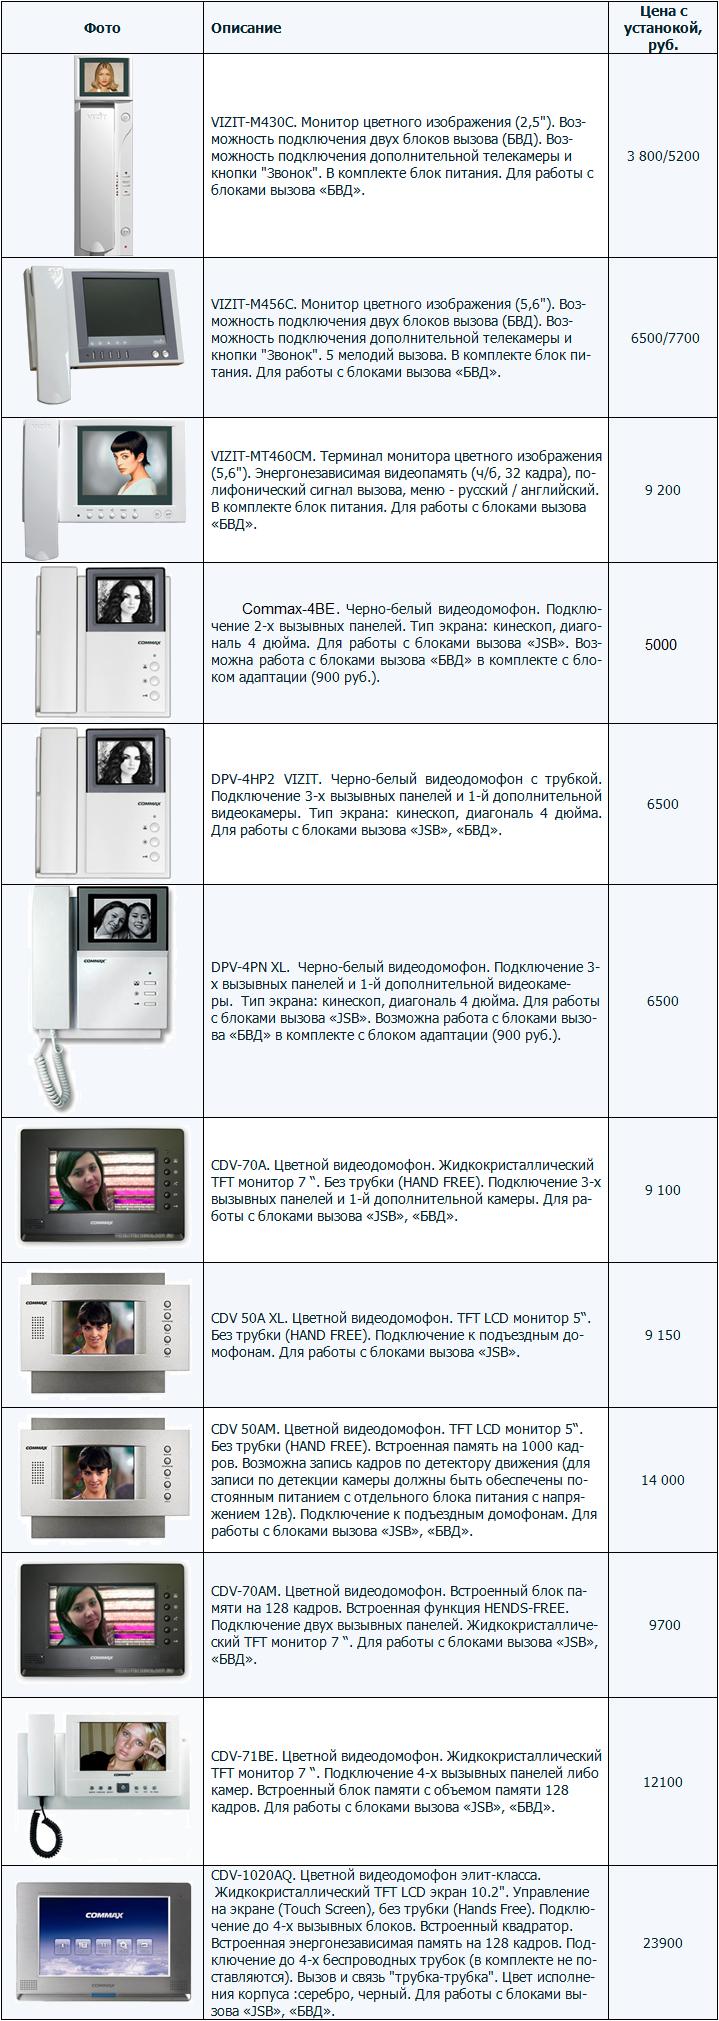 Модели видеодомофонов (мониторы). VIZIT-М430С, М456C, МT460CM, Commax DPV-4HP2, DPV-4HP2, DPV-4PN XL, CDV-70A, 50A XL, 50AM, 70AM, 71BE, CDV-1020AQ - цветной видеодомофон элит-класса. Жидкокристаллический LCD экран. Touch Screen Hands Free